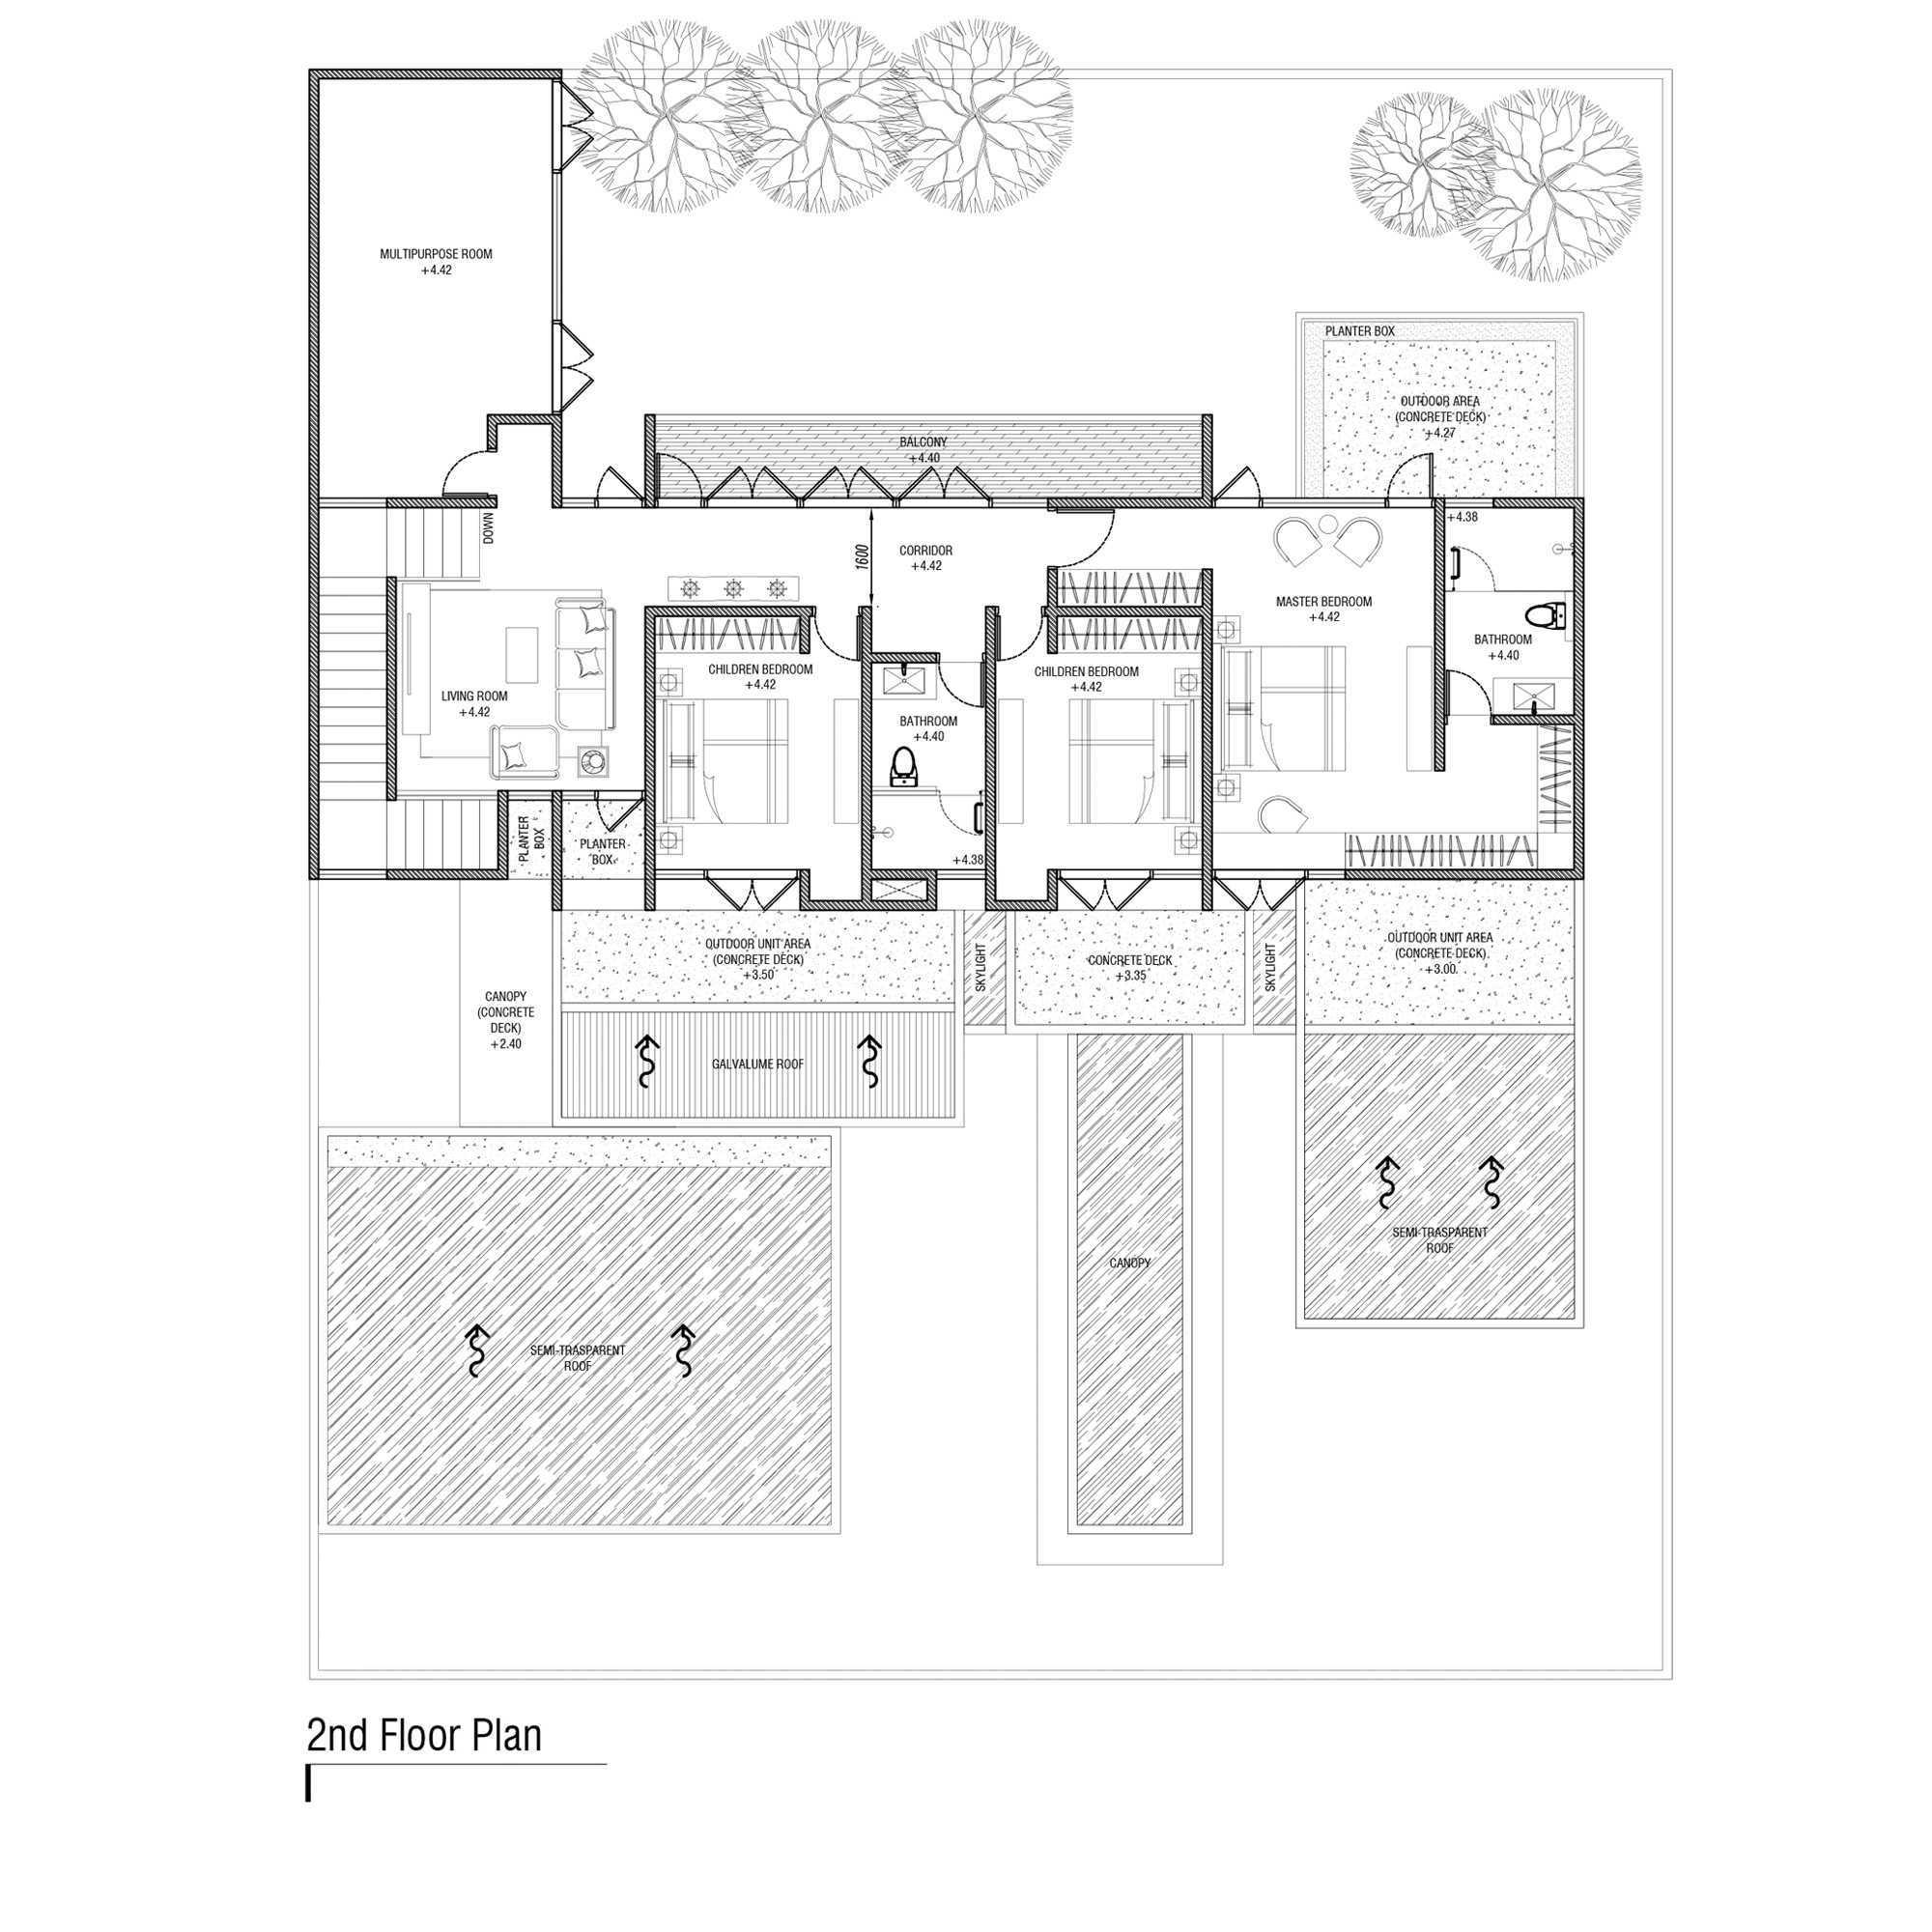 Y0 Design Architect S House Kec. Srono, Kabupaten Banyuwangi, Jawa Timur, Indonesia Kec. Srono, Kabupaten Banyuwangi, Jawa Timur, Indonesia Yohanes-Iswara-Limandjaya-S-House  121107